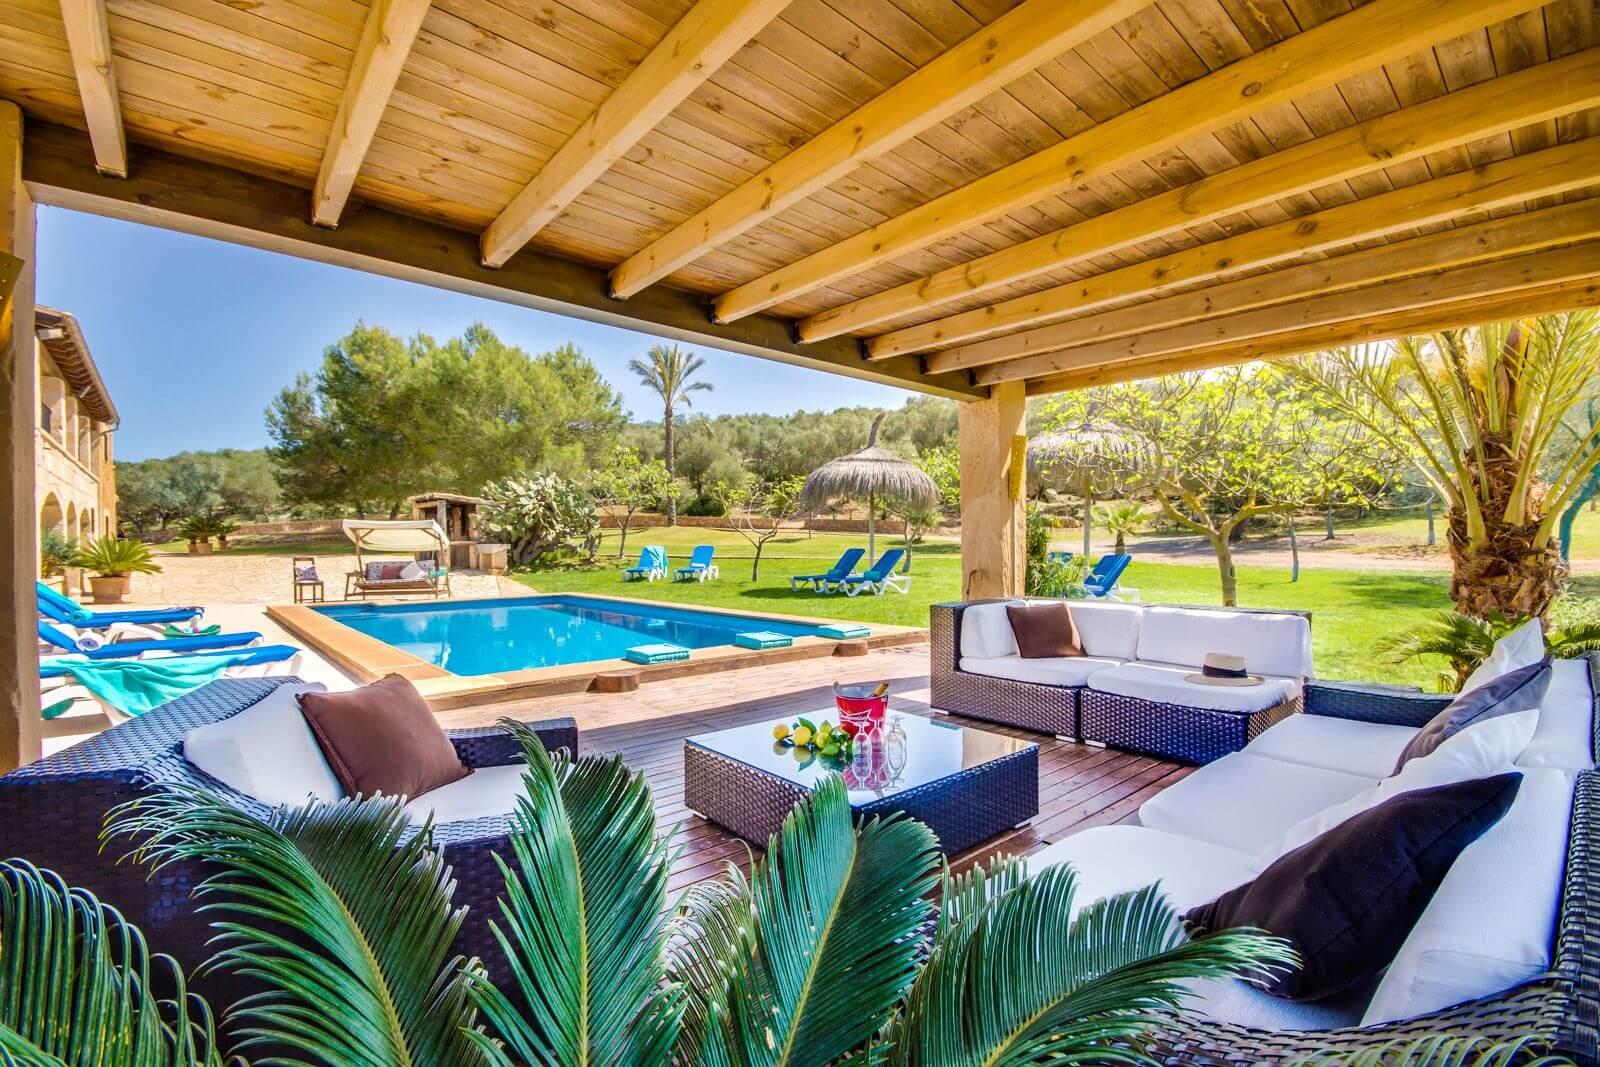 Finca Toni - überdachte Lounge am Pool